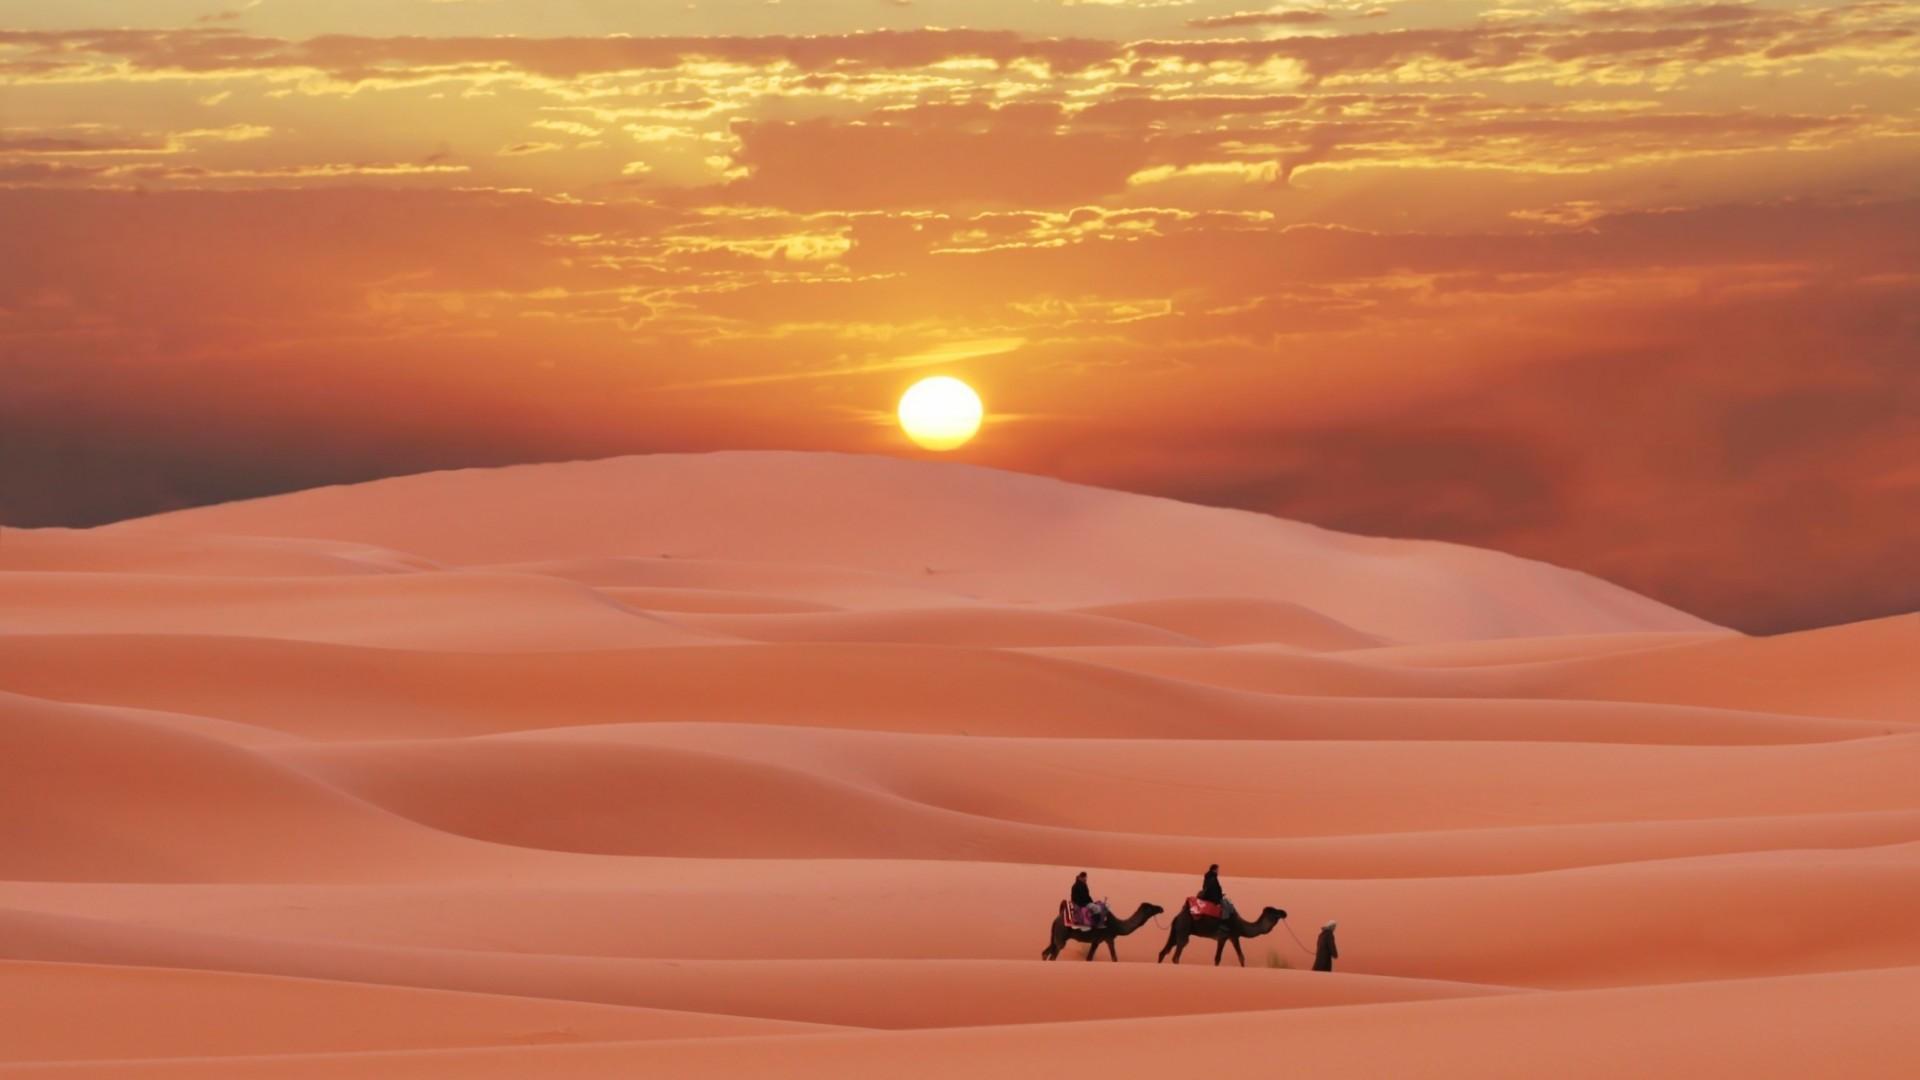 19632 download wallpaper Landscape, Sunset, Sand, Desert, Camels screensavers and pictures for free